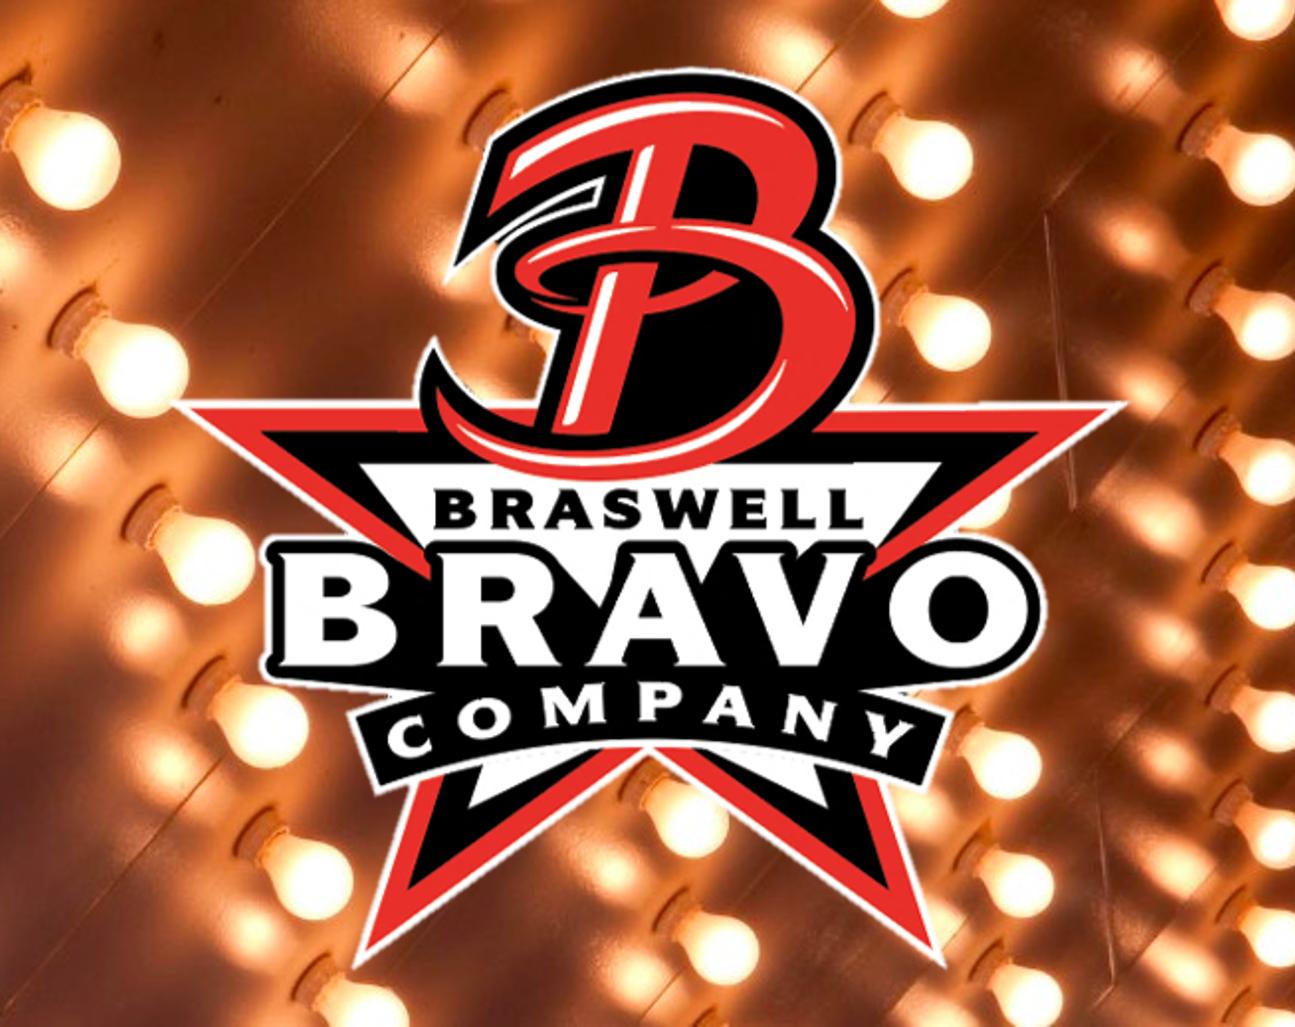 Braswell Bravo Booster Club